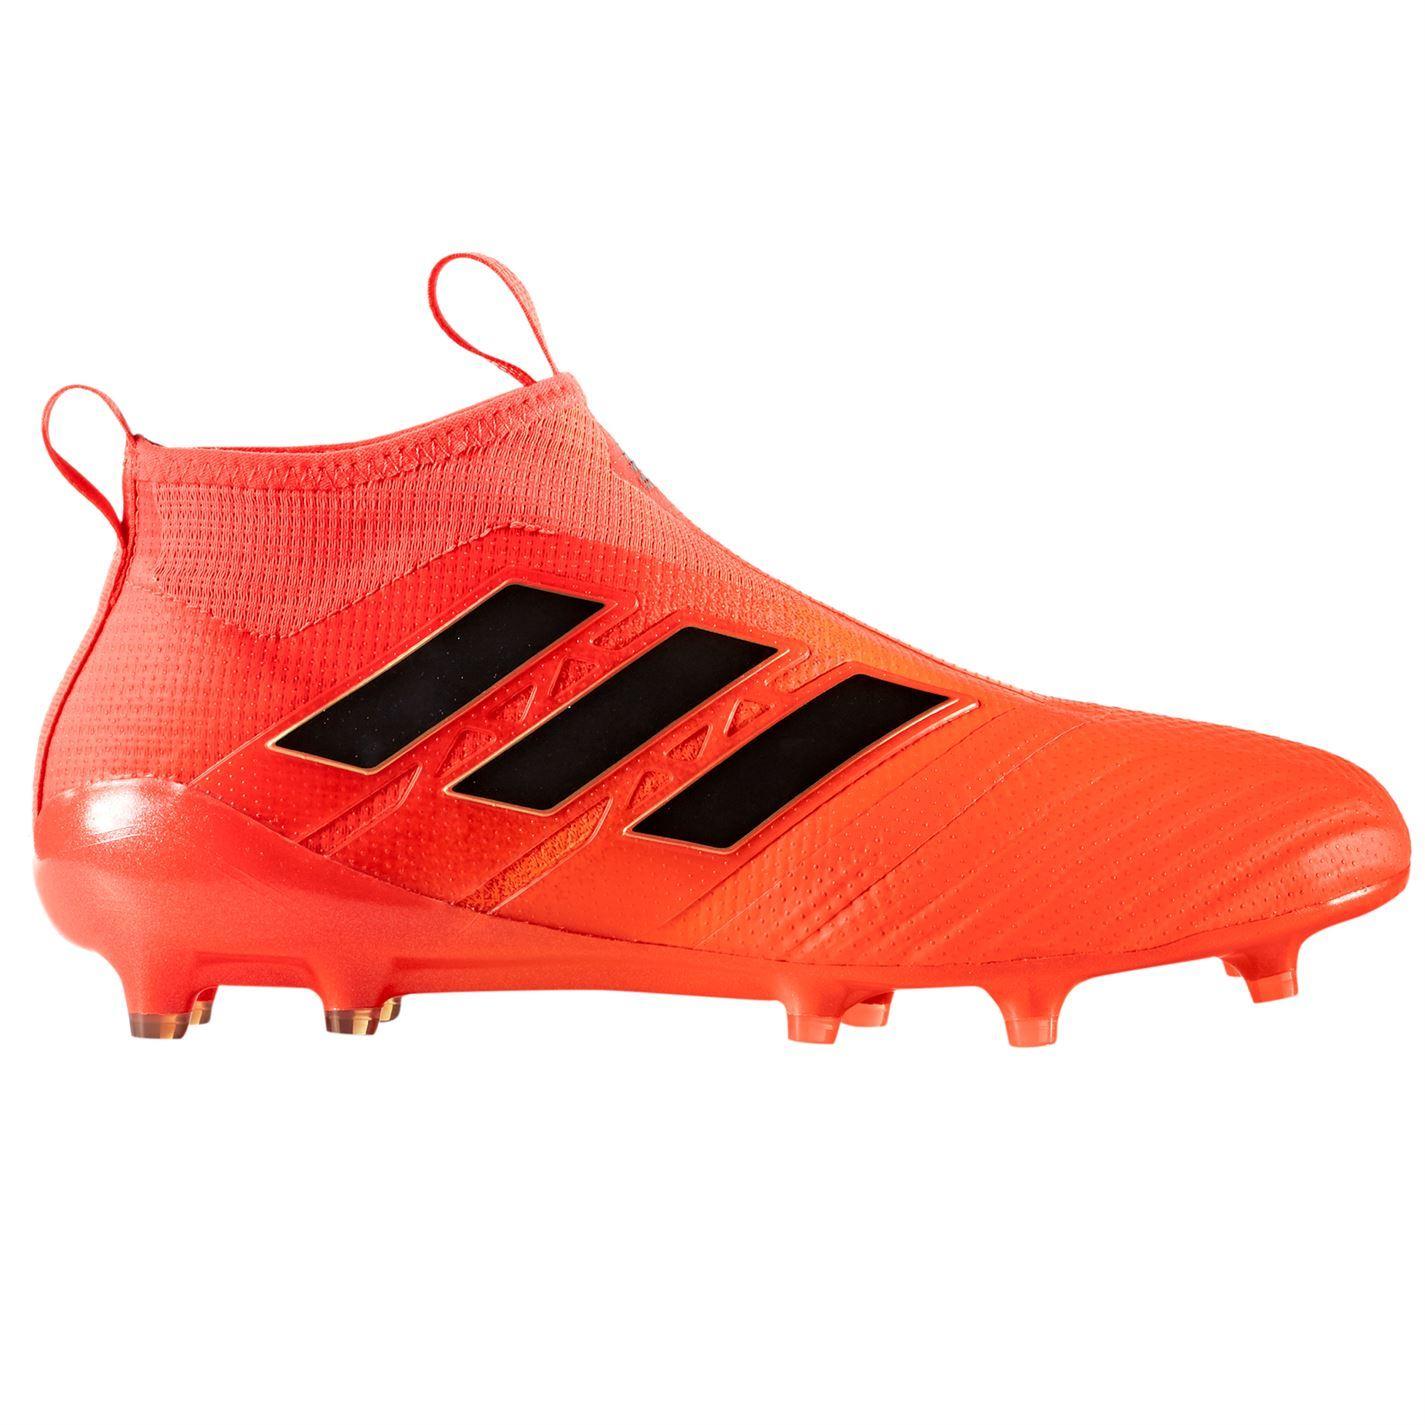 b88e30e2d27 adidas Ace 17 Purecontrol FG Laceless Football Boots Mens Orange Soccer  Cleats